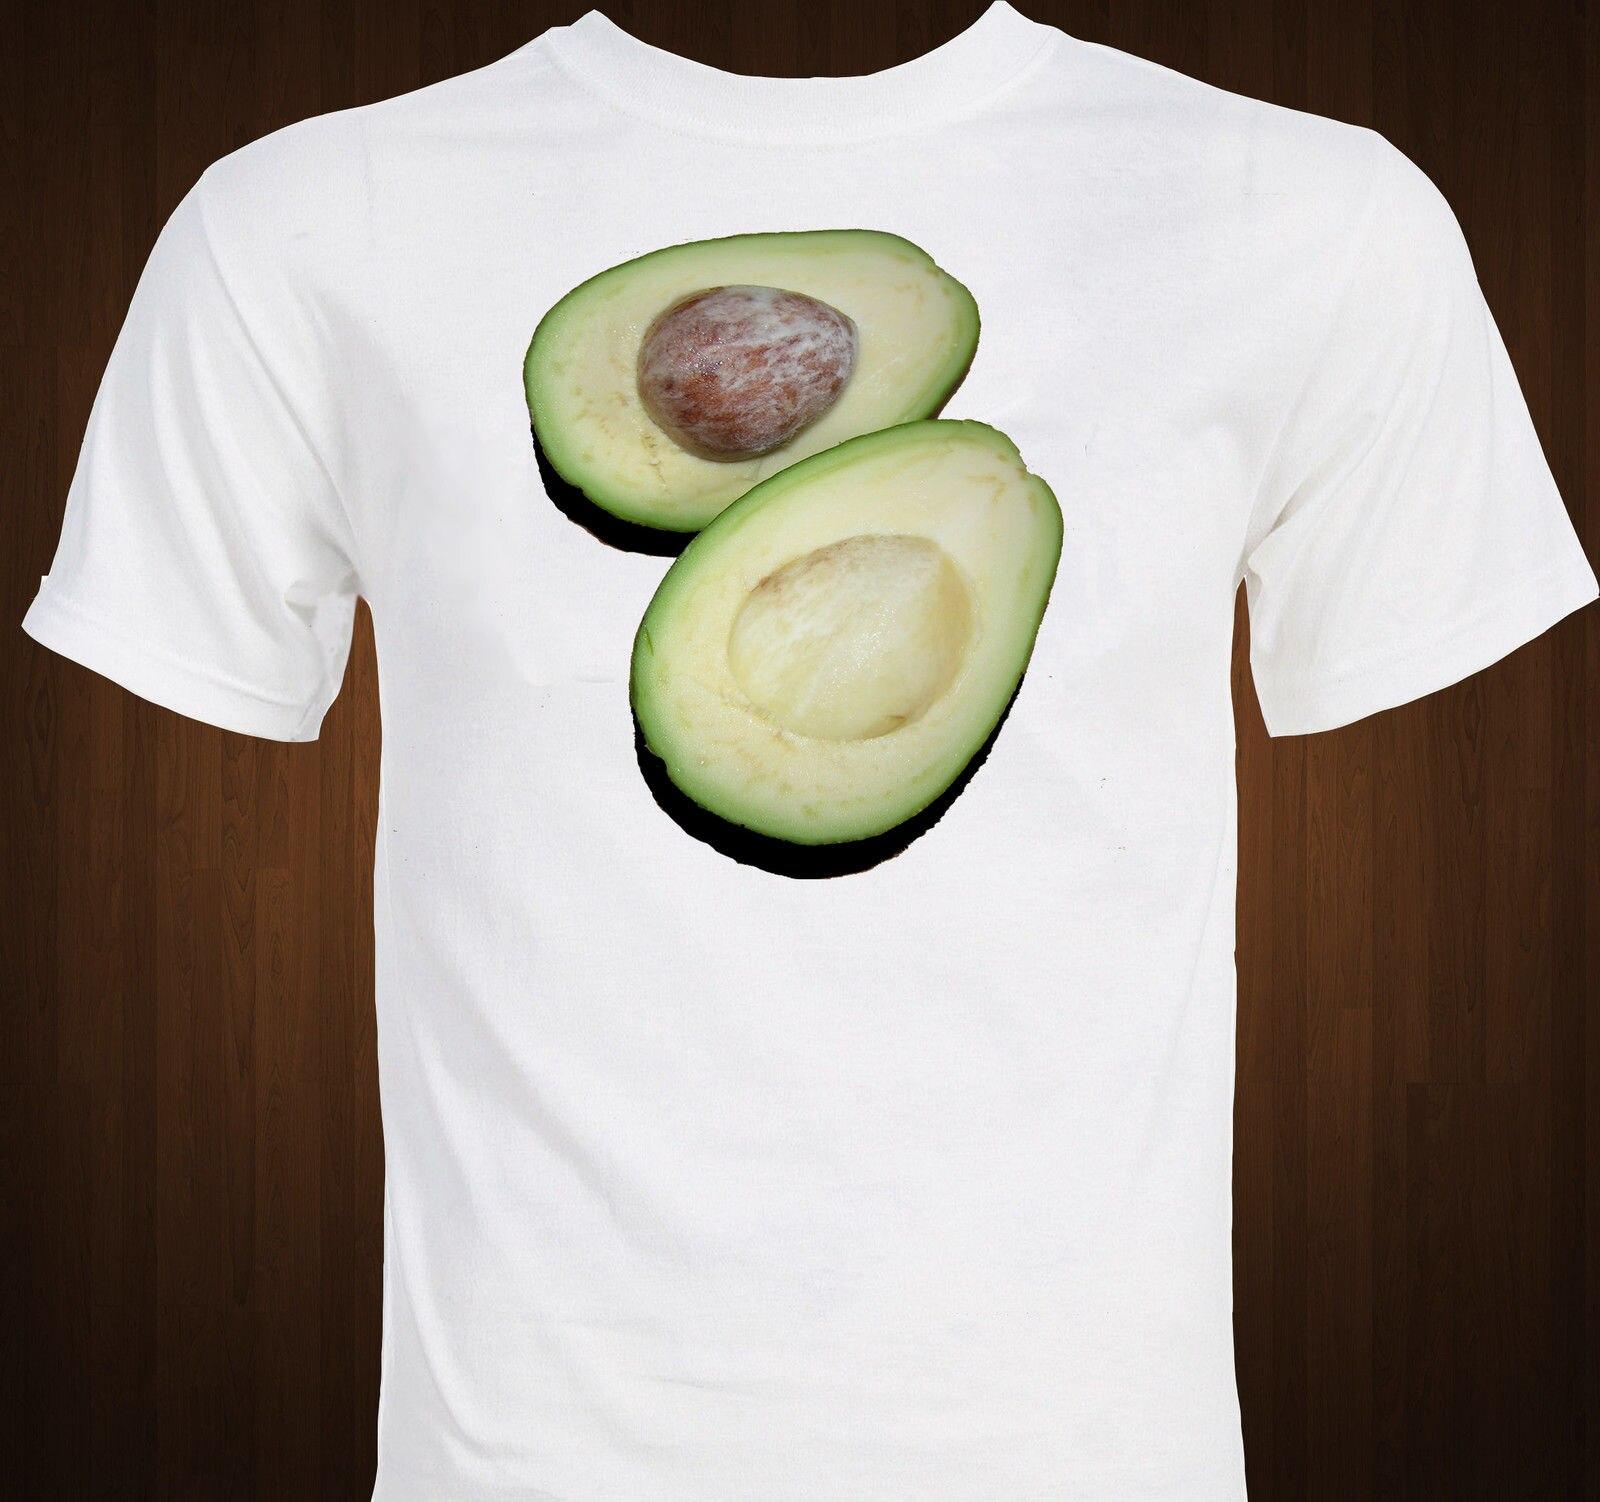 2019 Novos Homens Camisas de Manga Curta T Delicioso Saúde Alimentar-Verde Deliciosa Fruta Abacate-Mmm Healthyshirt Design do Site